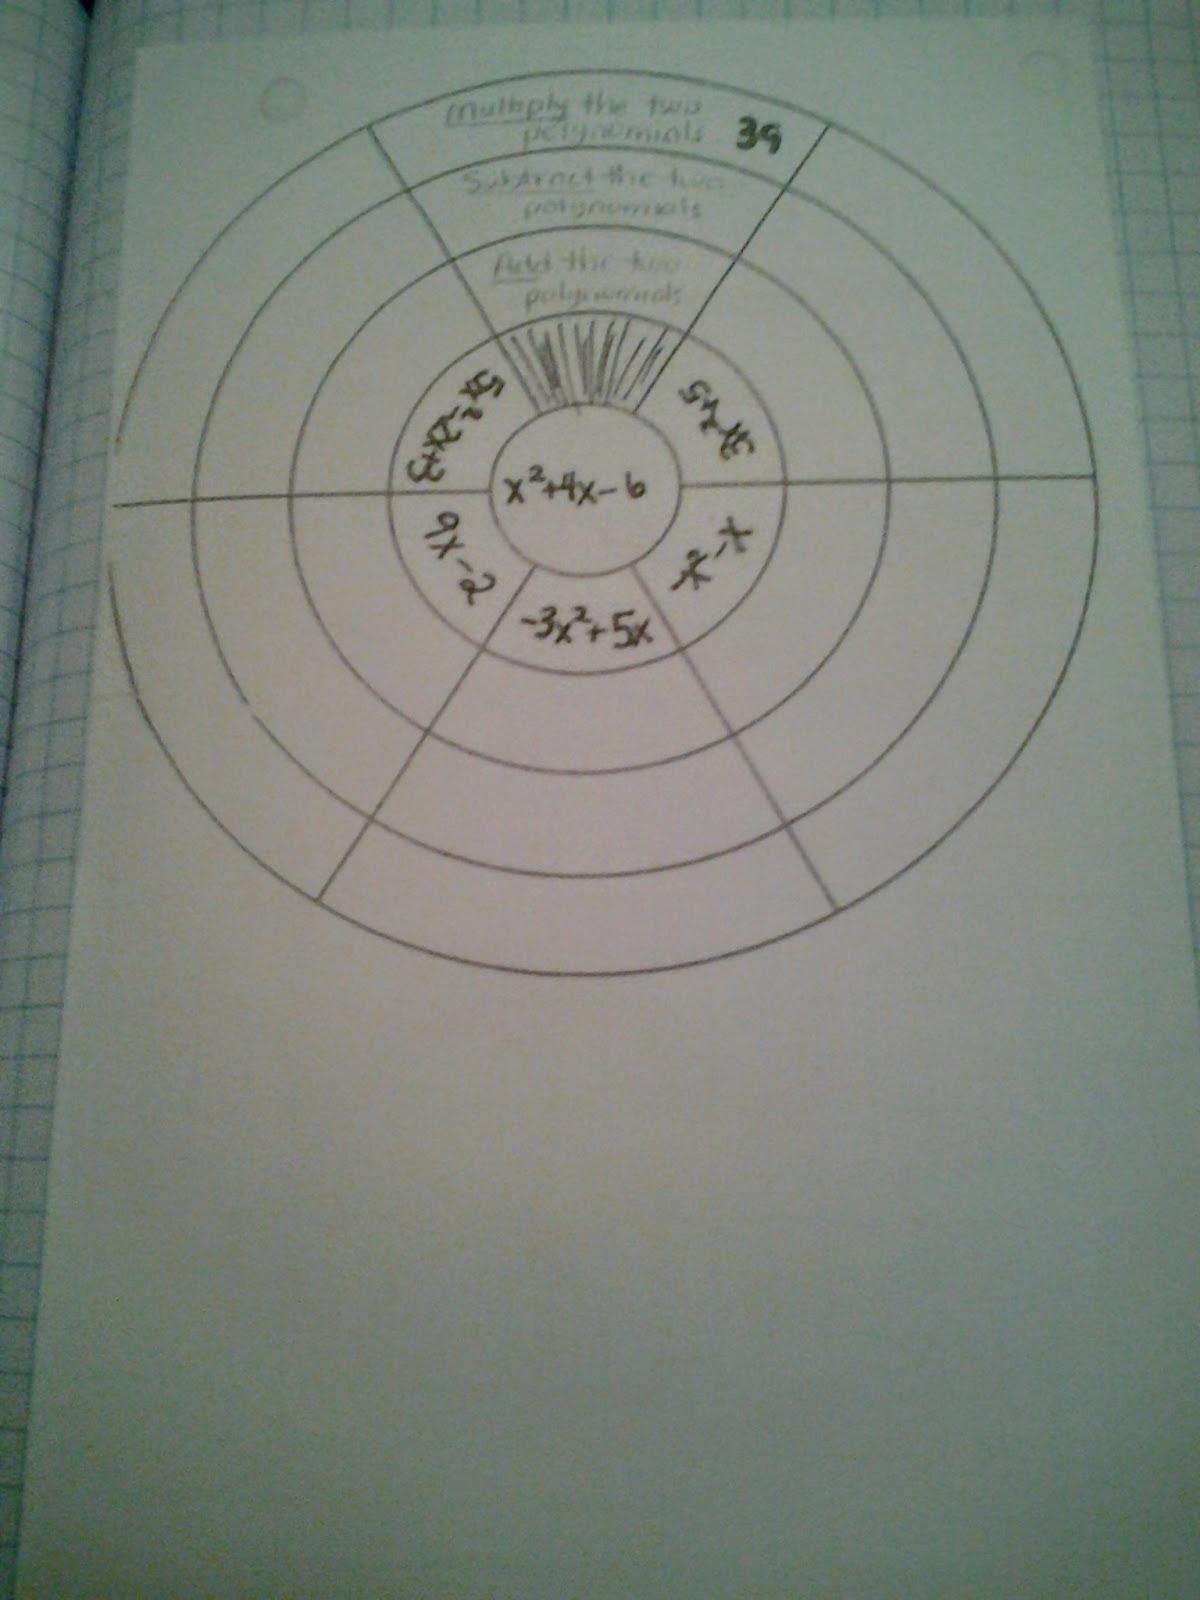 Bulls Eye Worksheet